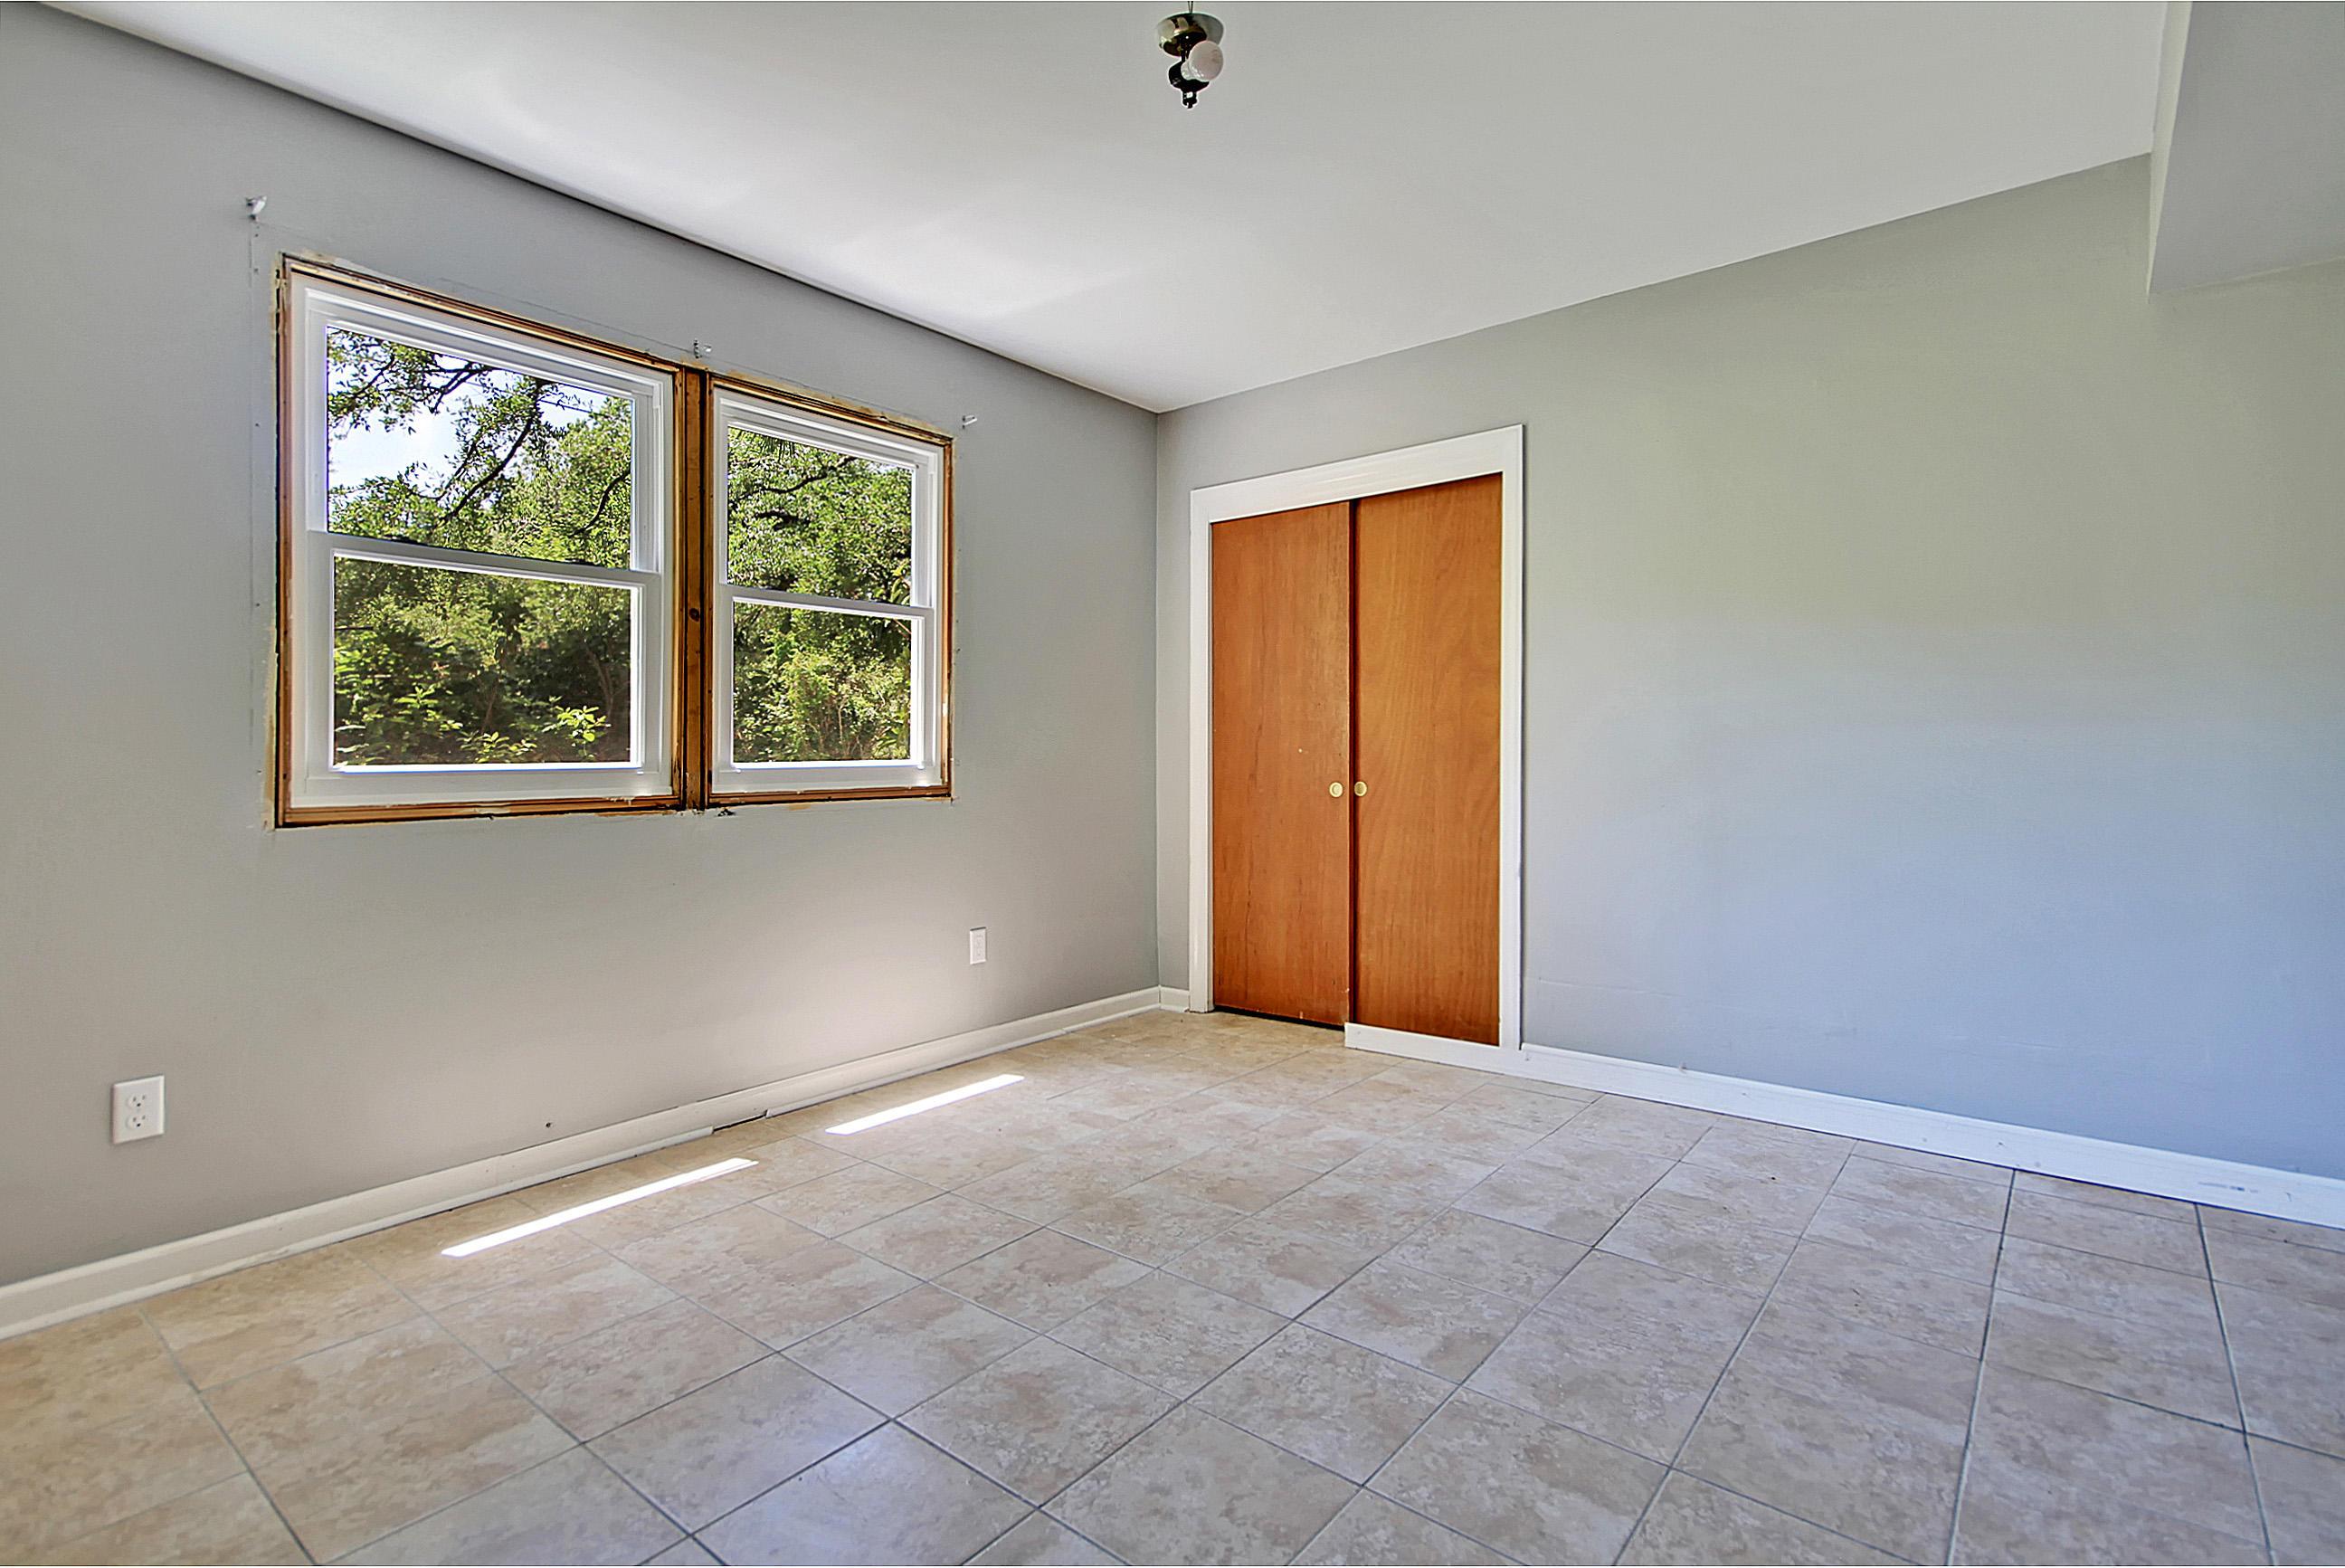 Northbridge Terrace Homes For Sale - 1094 Northbridge, Charleston, SC - 12